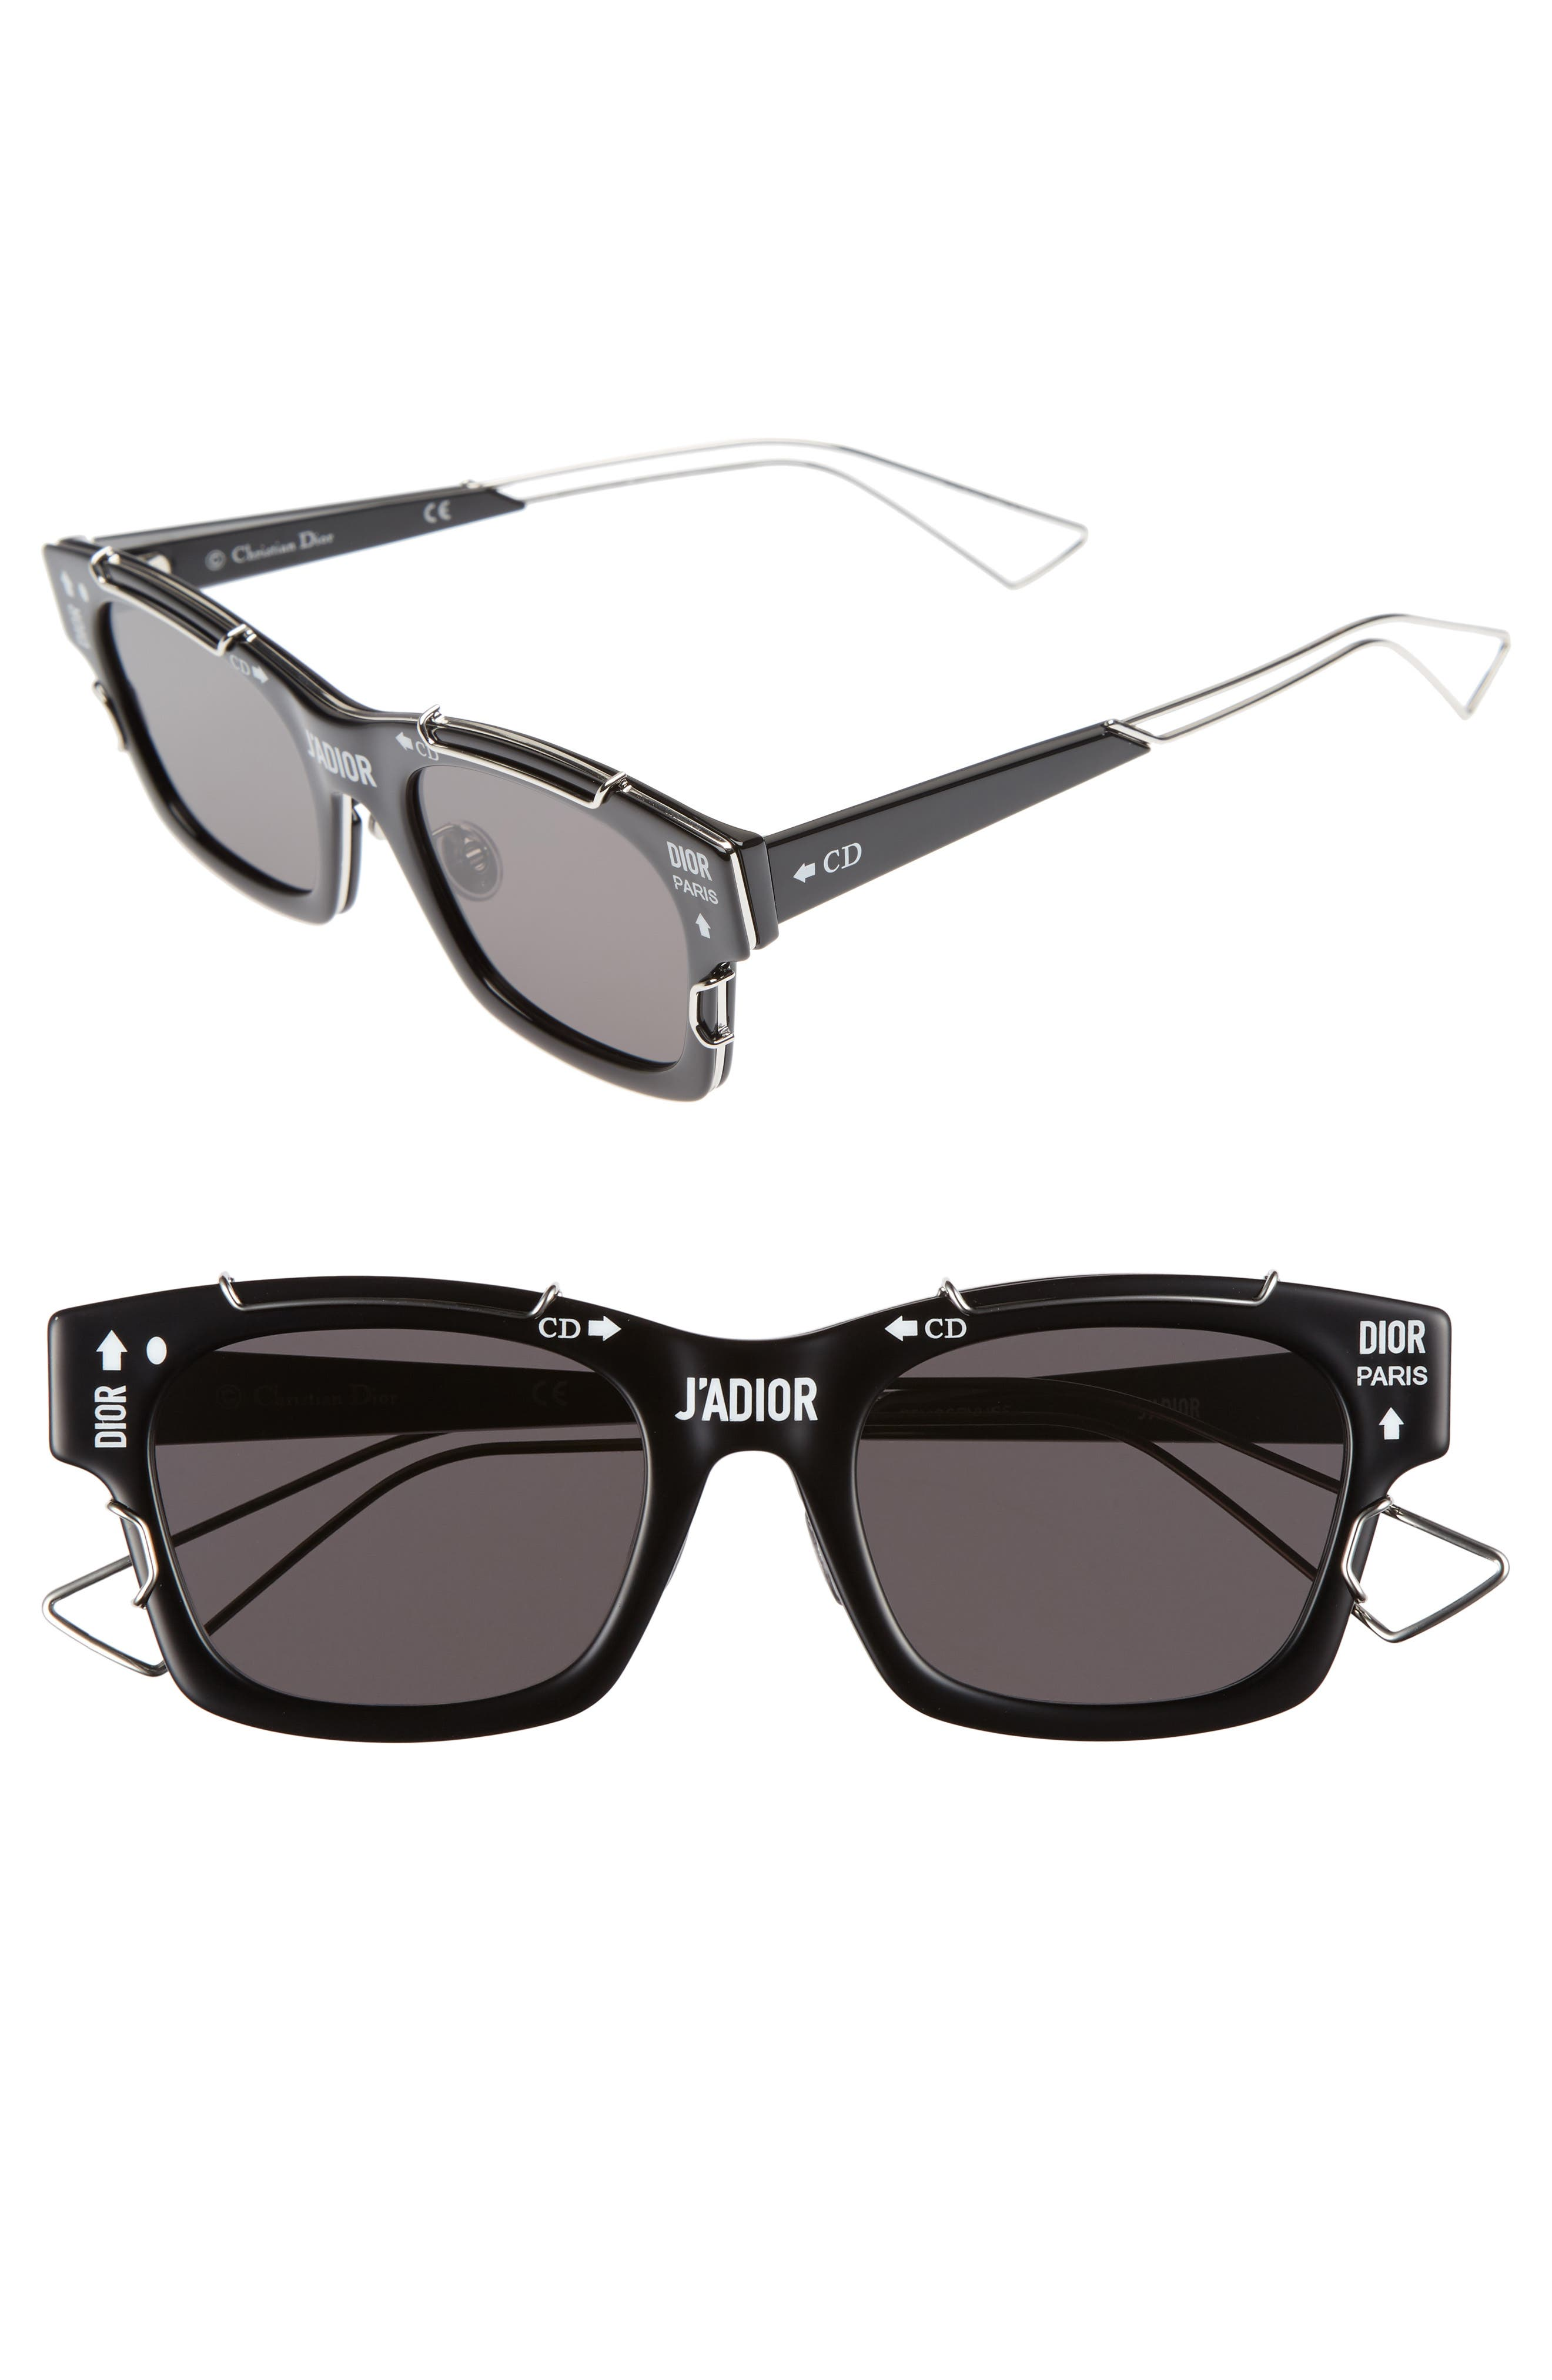 DIOR JAdior 51mm Sunglasses